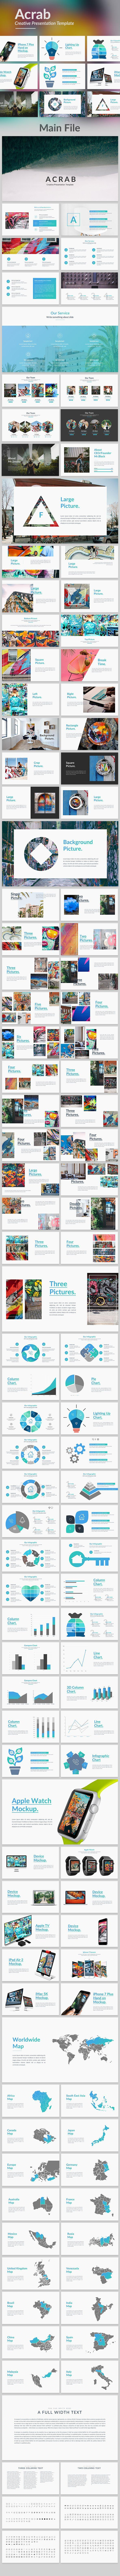 1611 best Presentation Templates images on Pinterest | Presentation ...